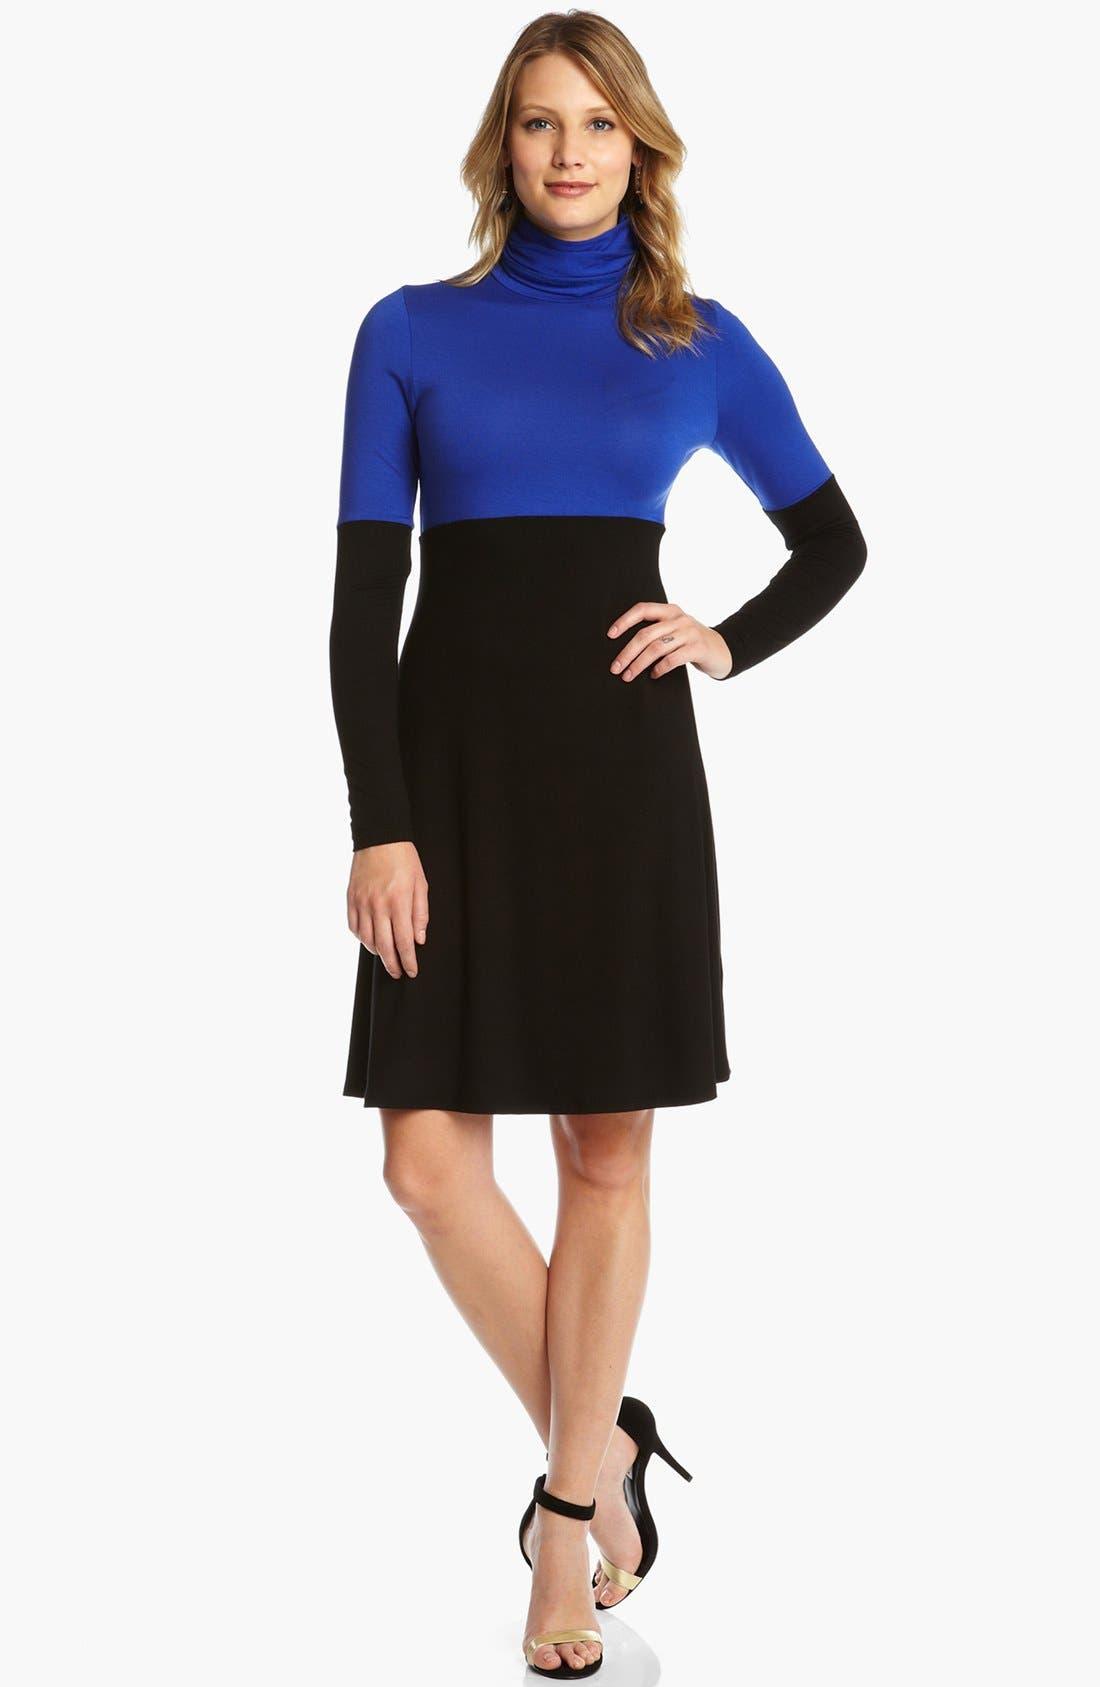 Alternate Image 1 Selected - Karen Kane Colorblock Turtleneck Dress